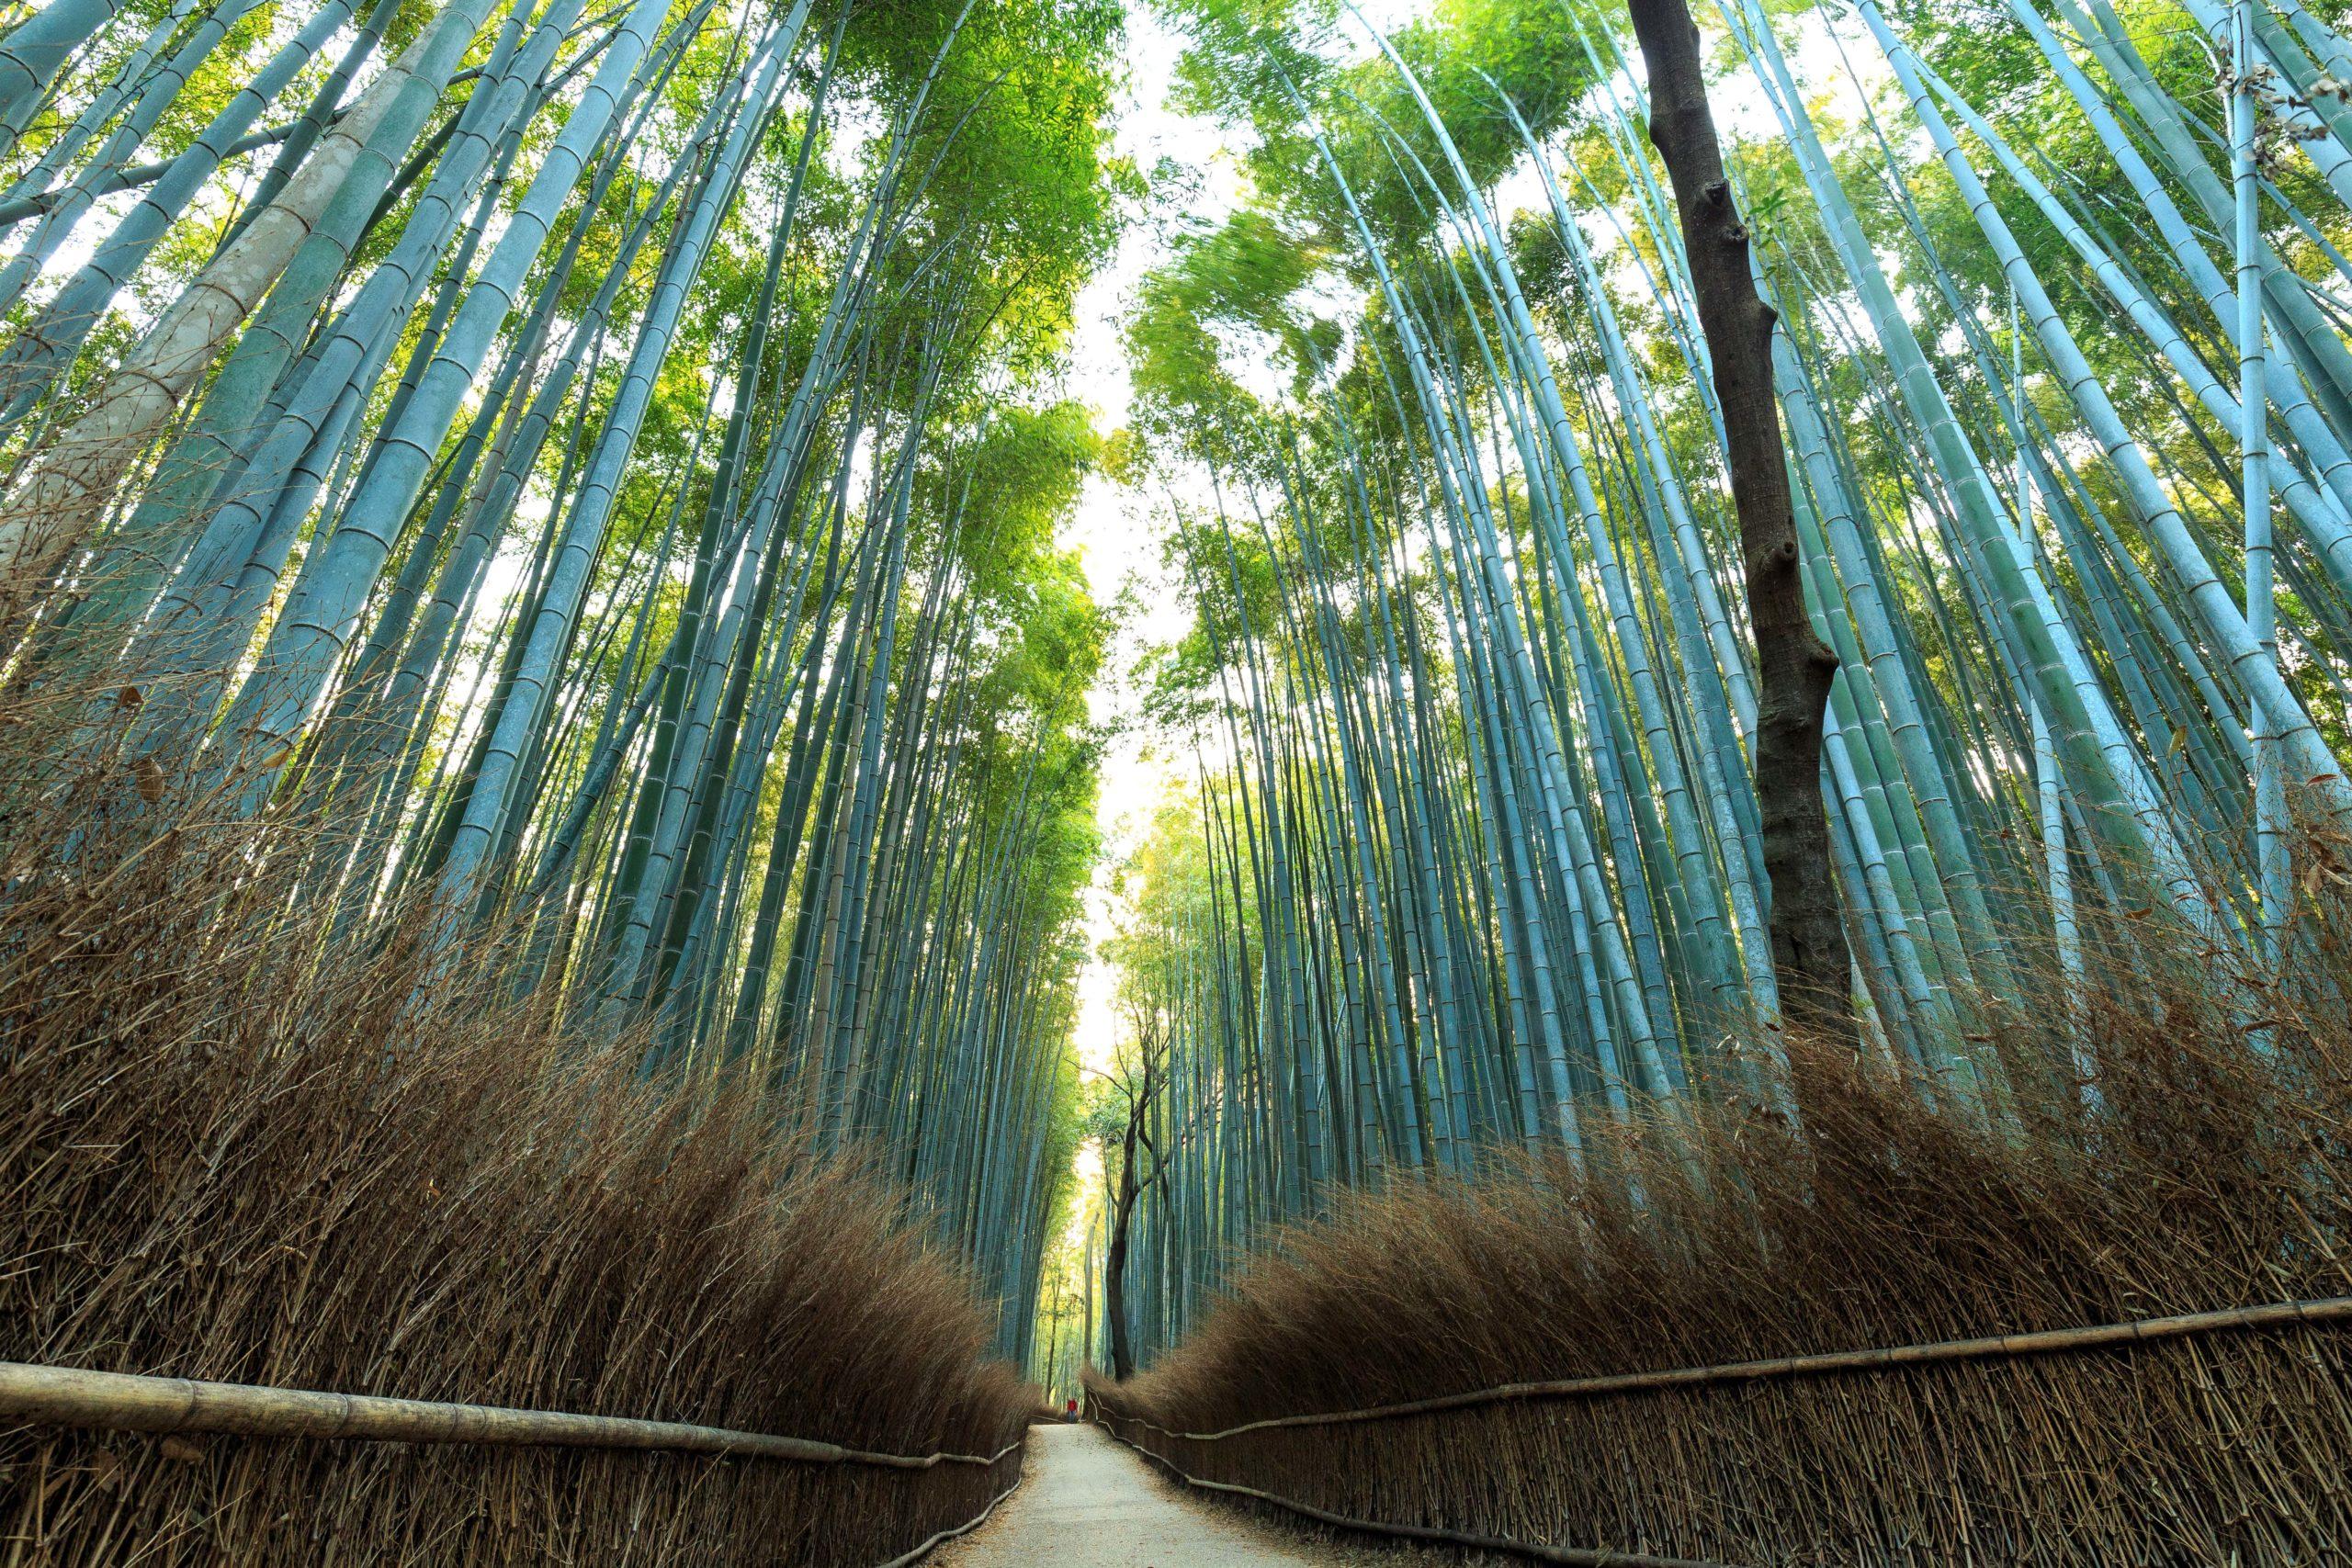 Bamboo Forrest nach Sonnenaufgang